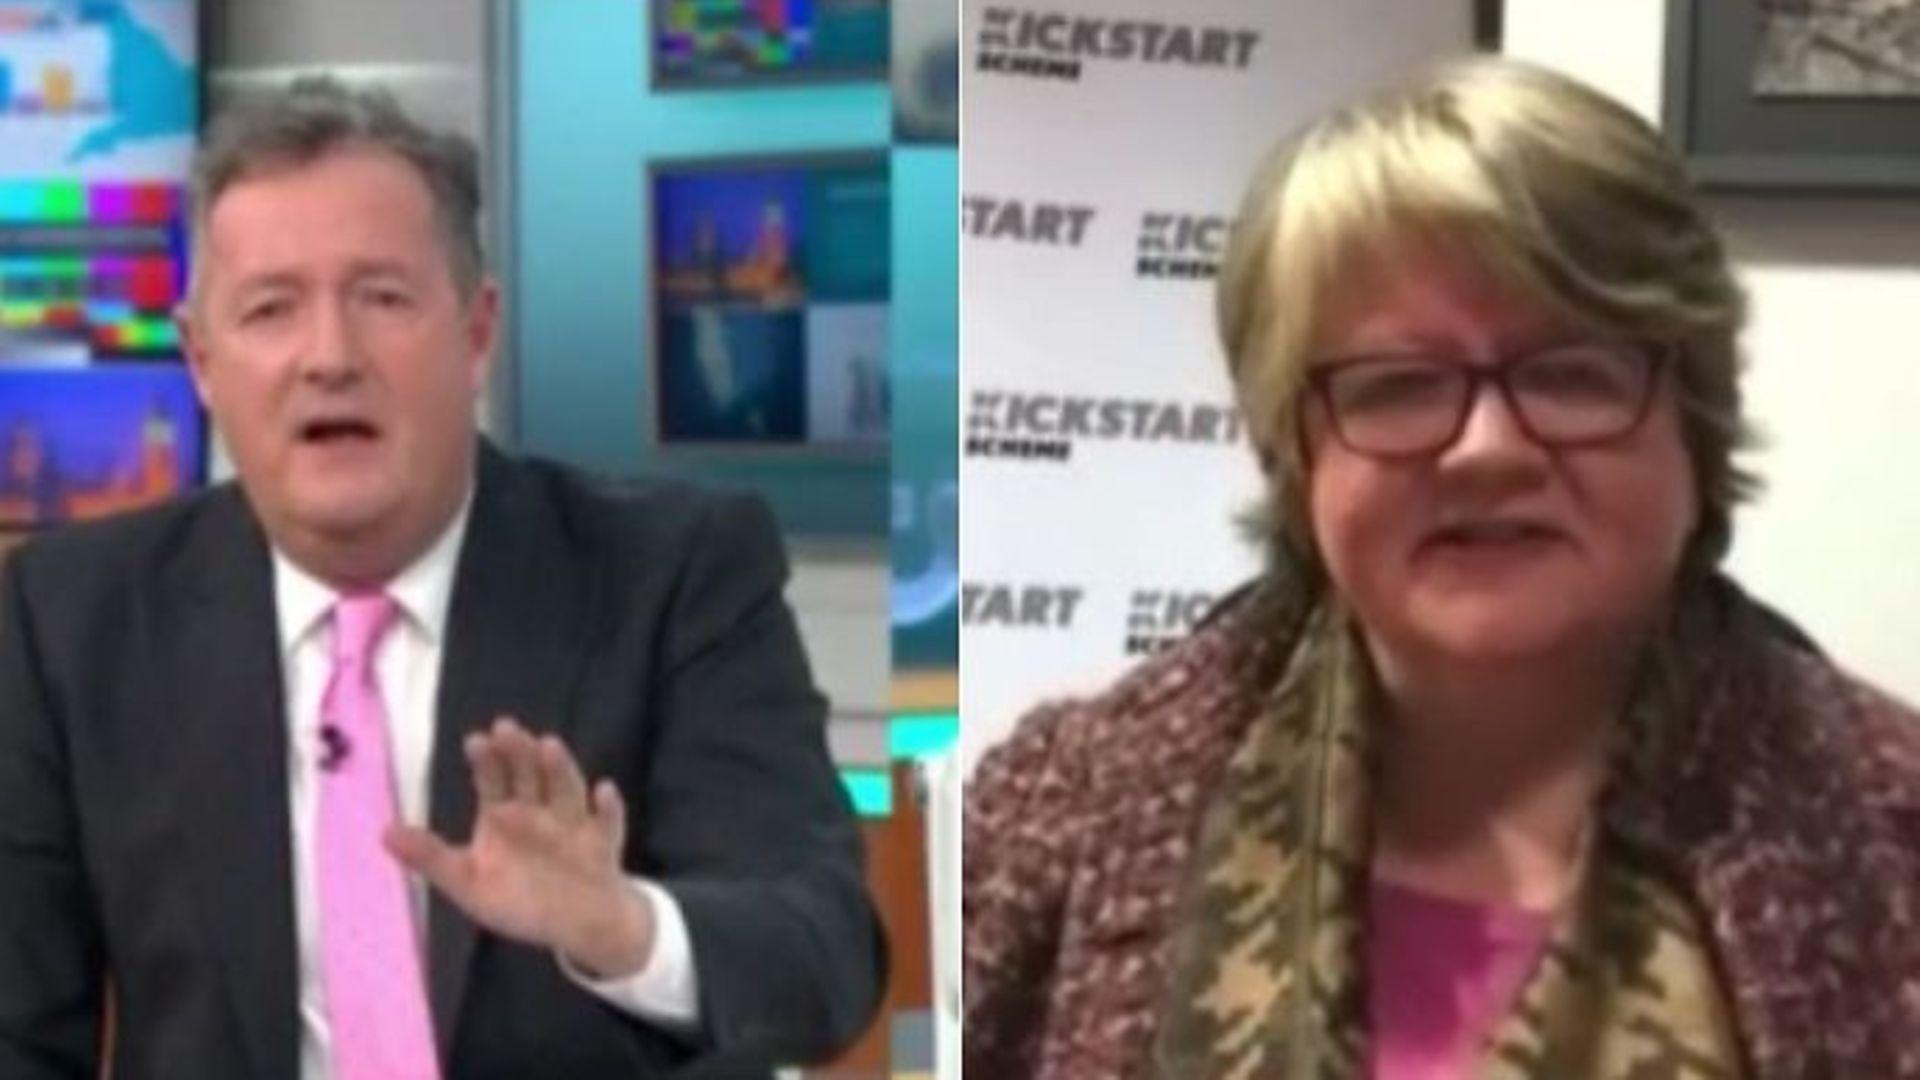 Good Morning Britain presenter Piers Morgan challenges Thérèse Coffey - Credit: ITV